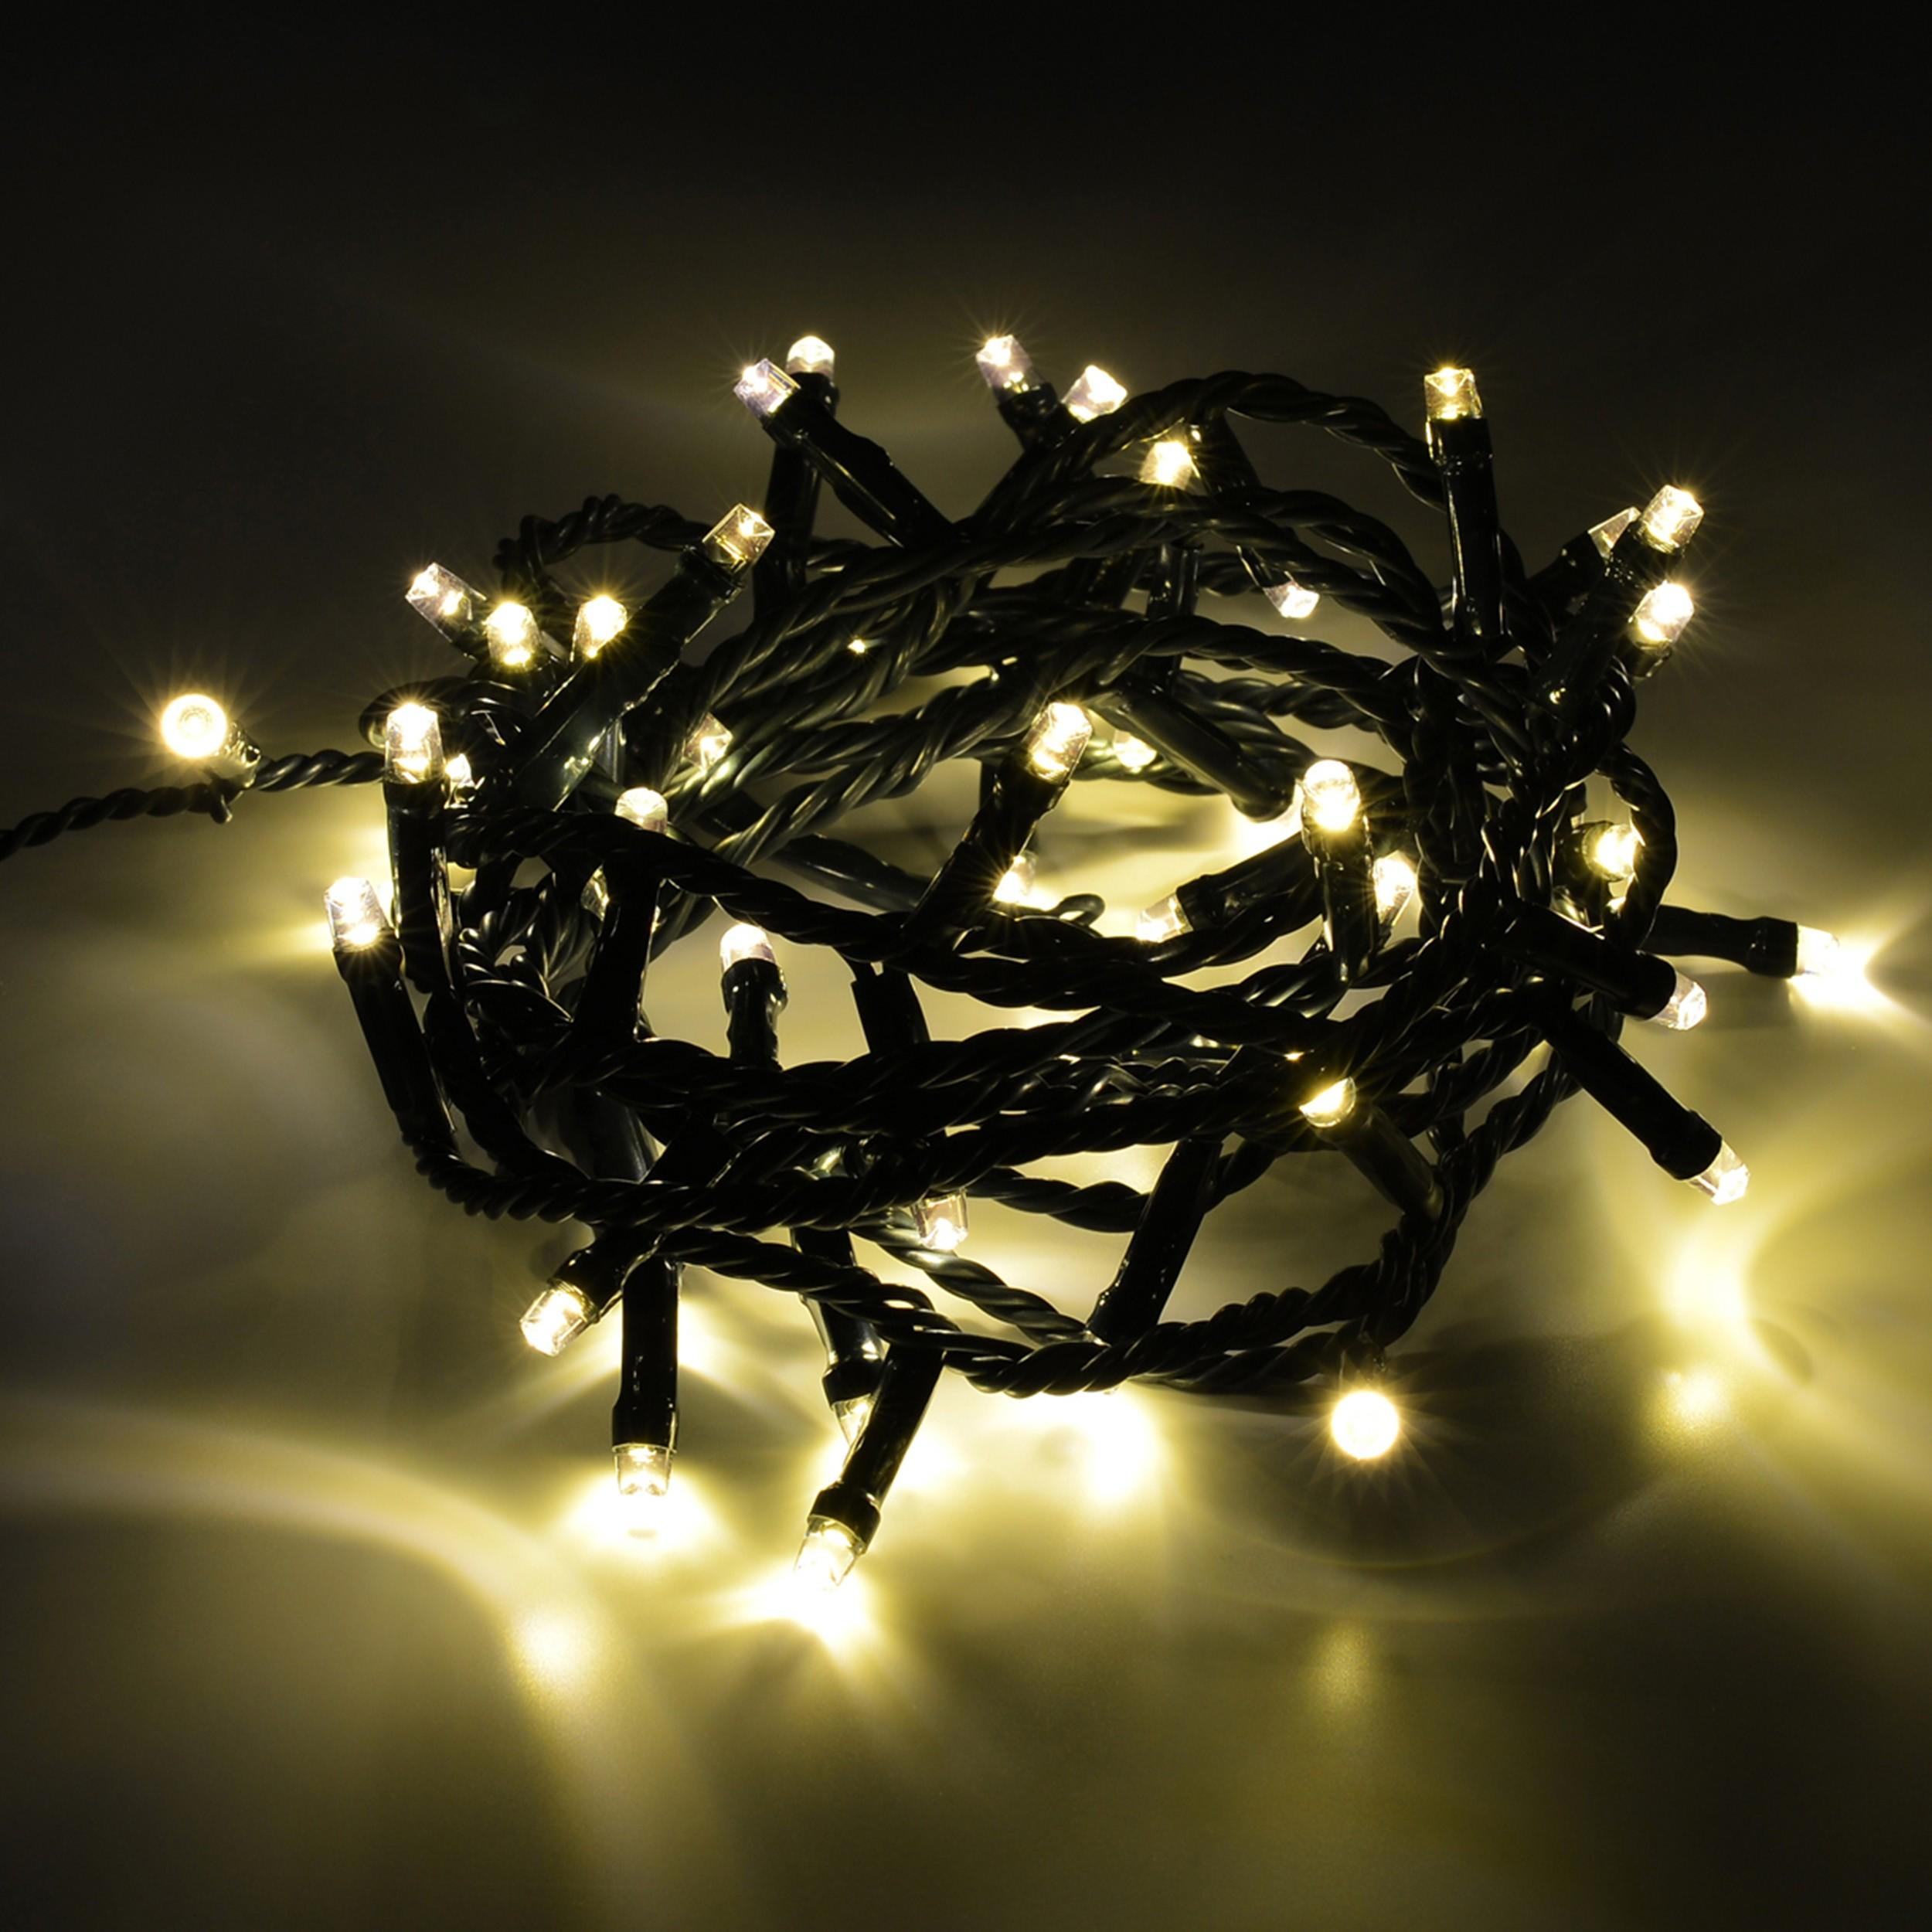 led lichterkette weihnachtsbeleuchtung 40 led outdoor innen au en ebay. Black Bedroom Furniture Sets. Home Design Ideas